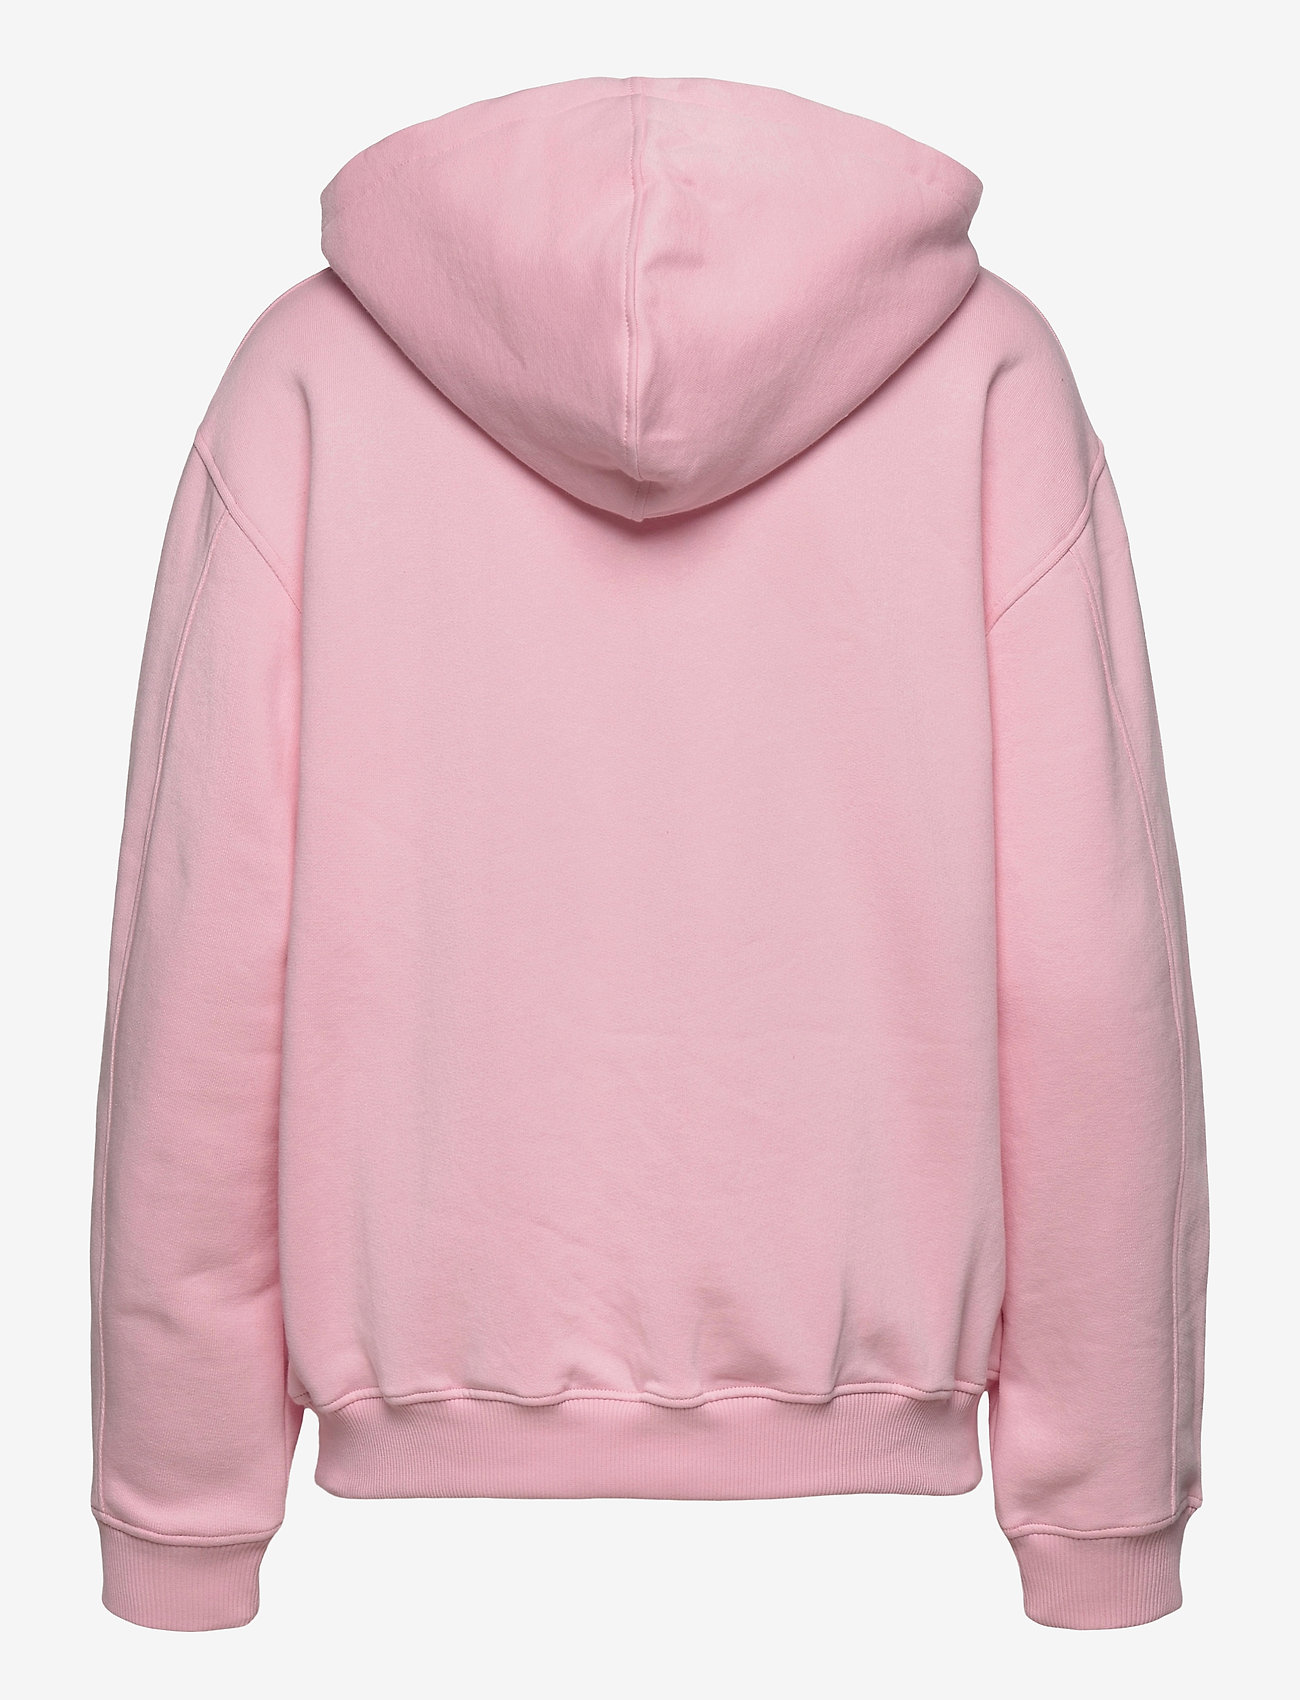 STINE GOYA - Adrisa, 1209 Tracksuit Goya - sweatshirts & hættetrøjer - pink - 1